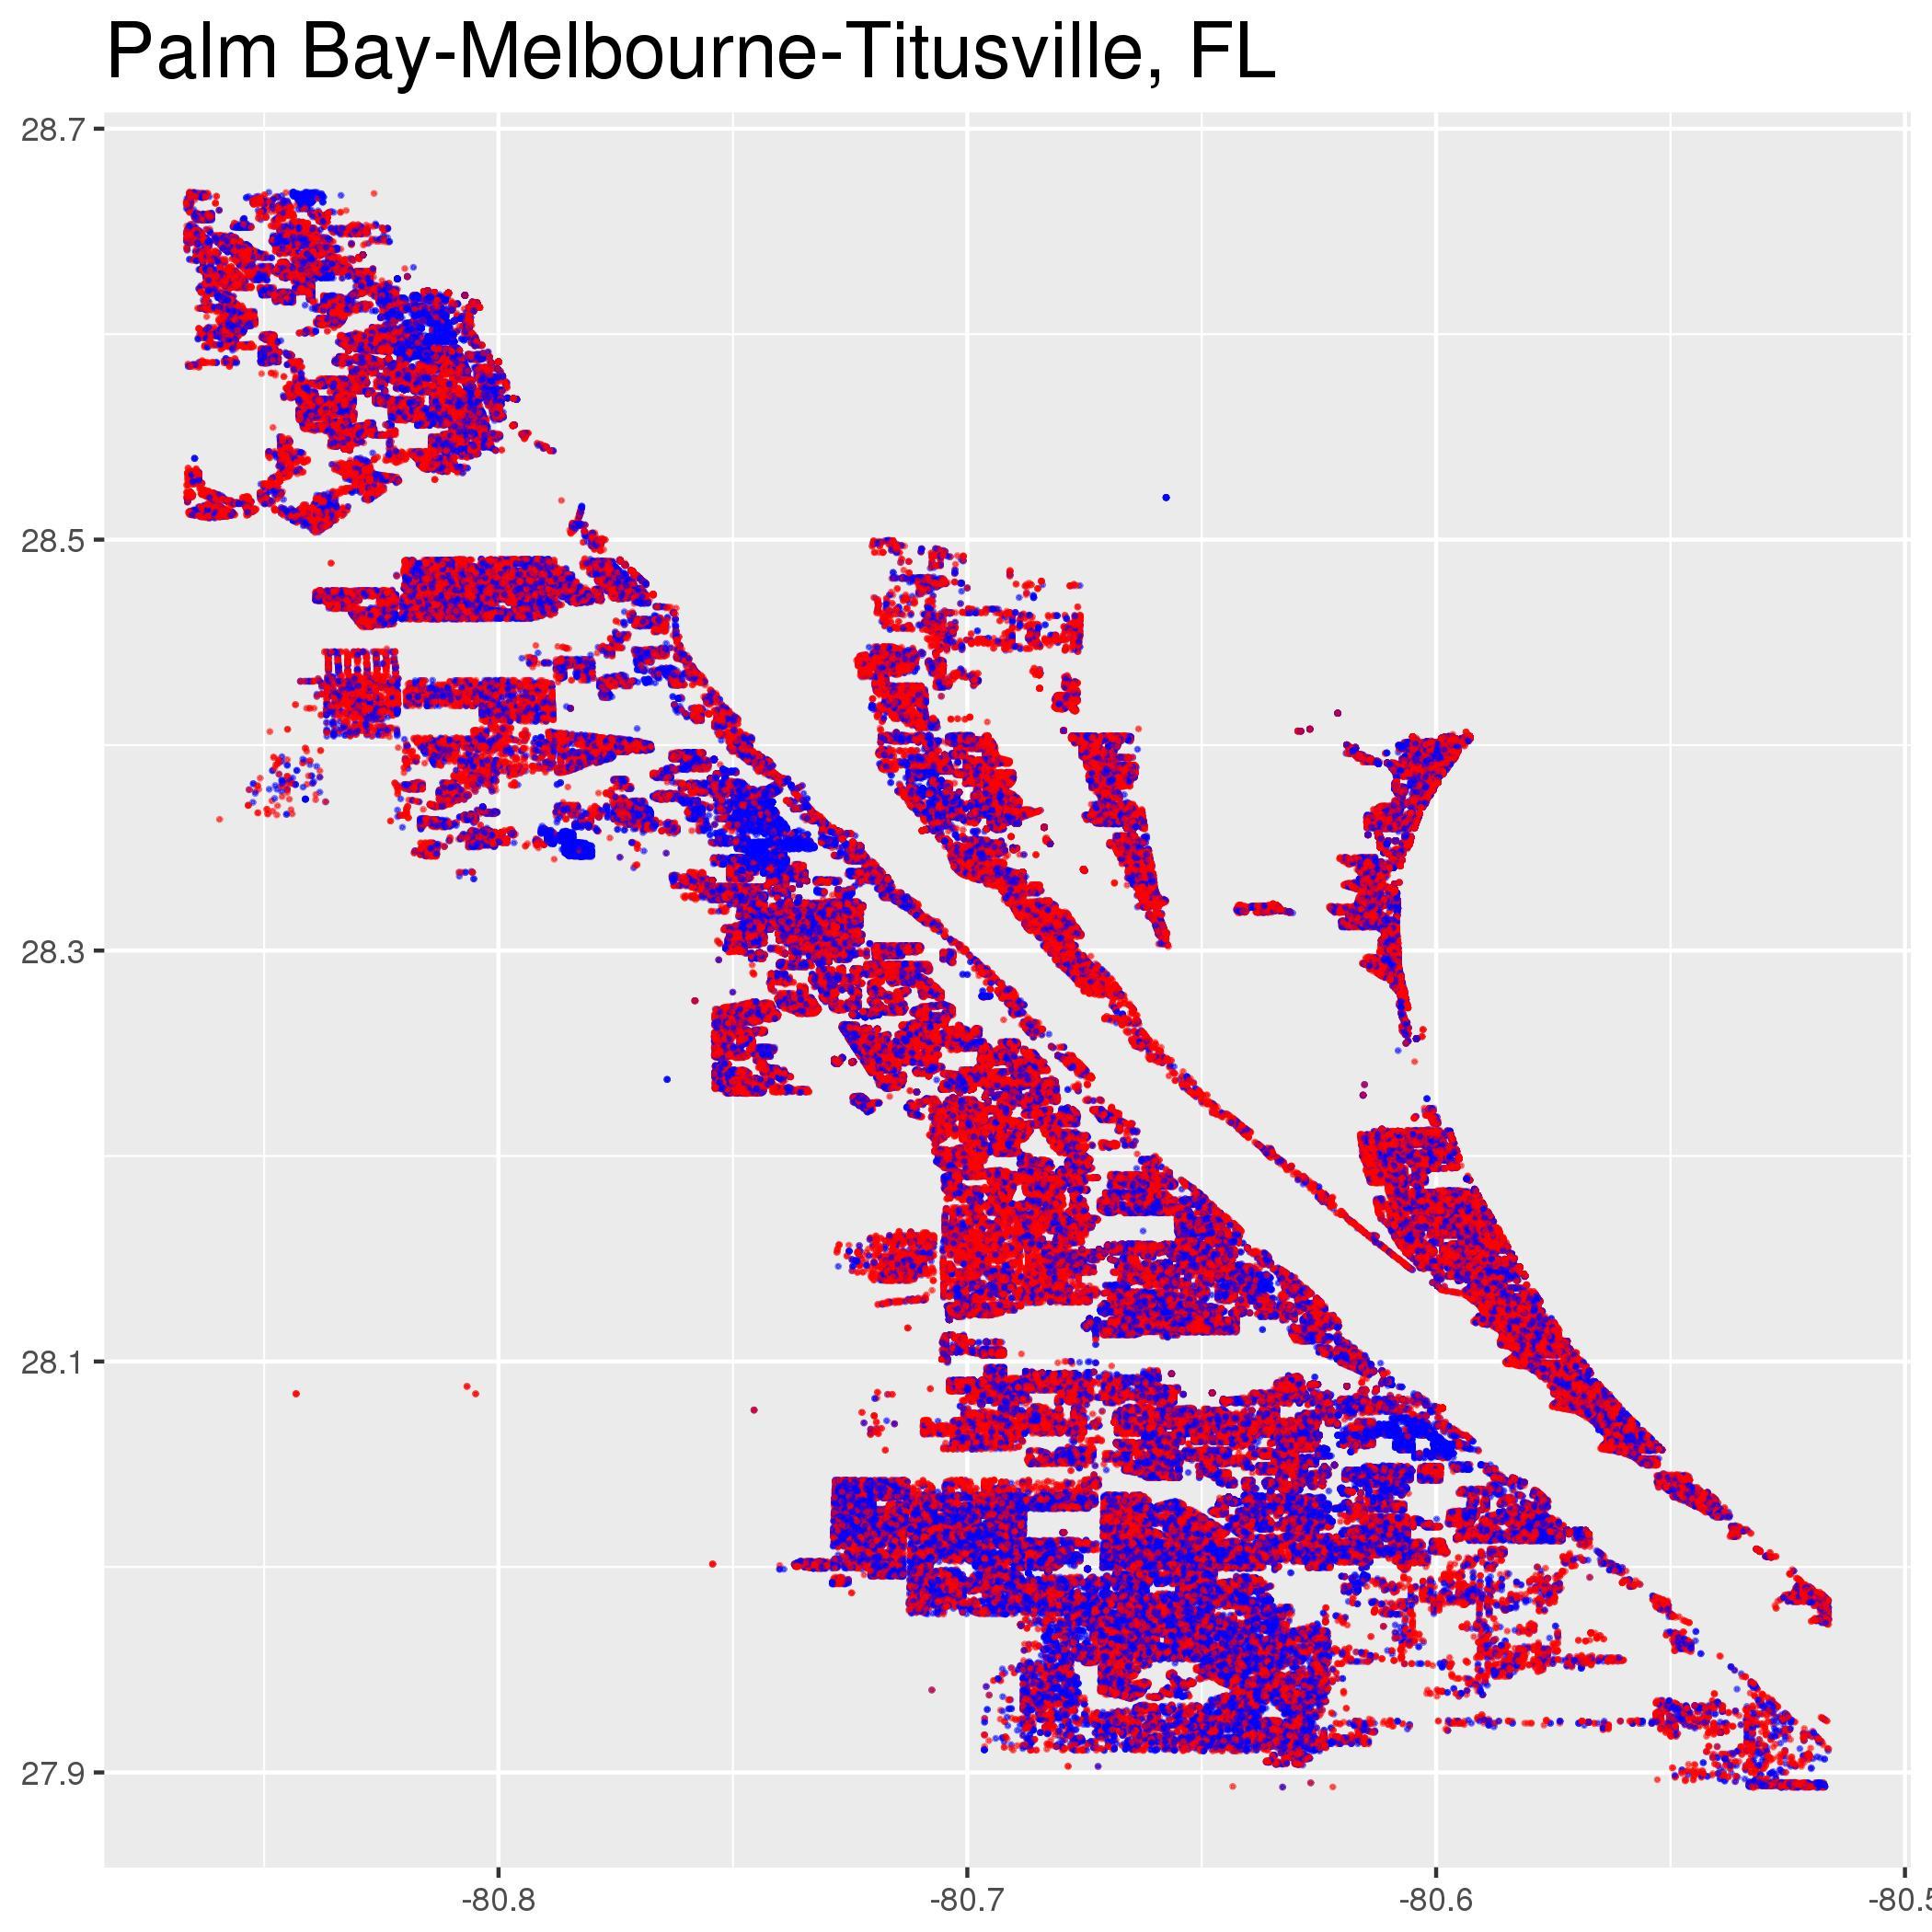 PalmBay-Melbourne-TitusvilleFL.jpeg